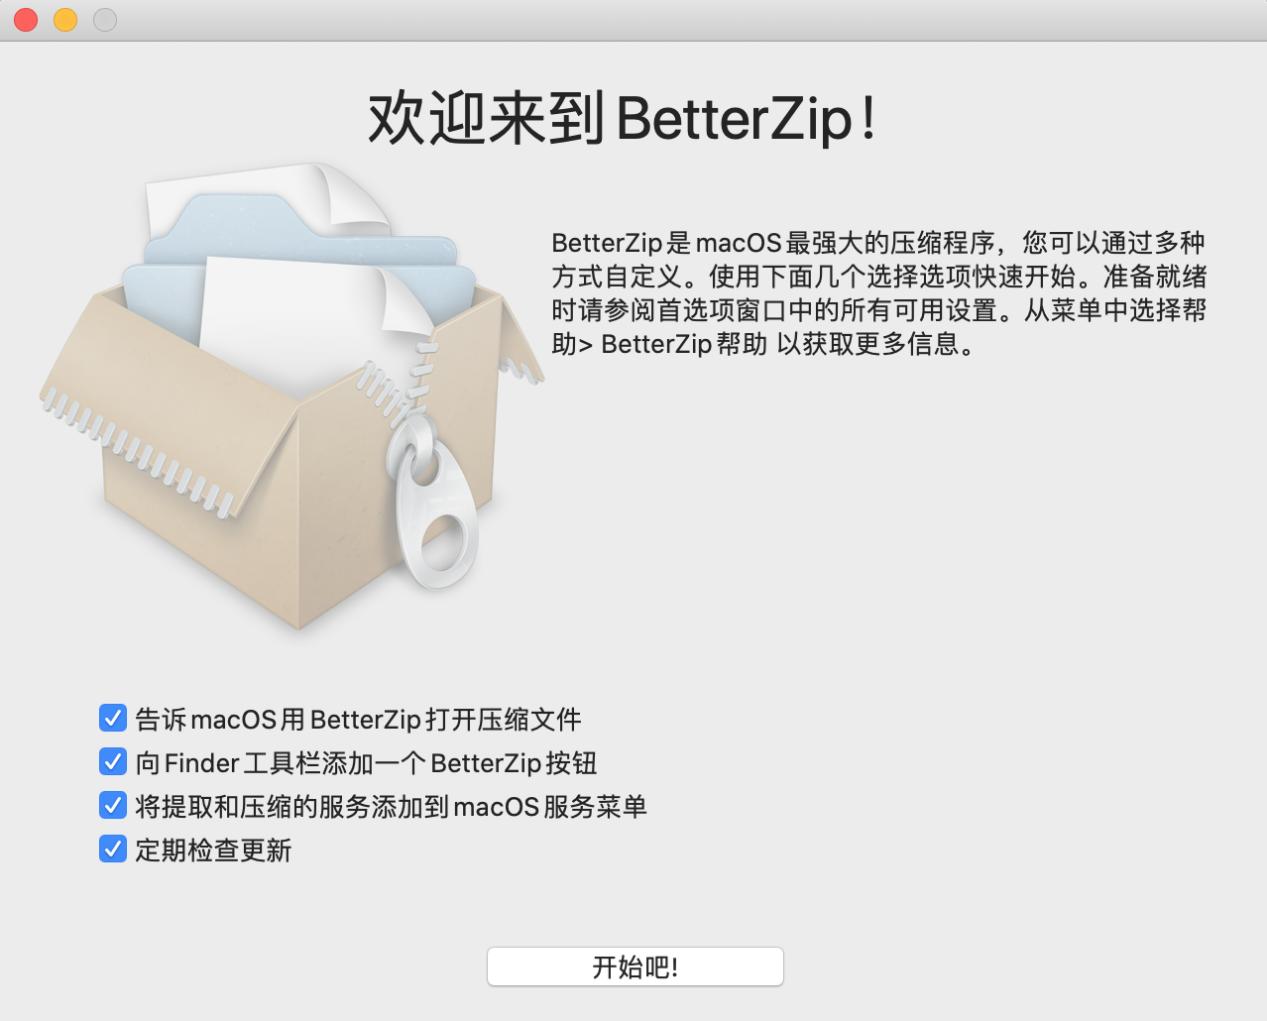 BetterZip安裝后初始界面